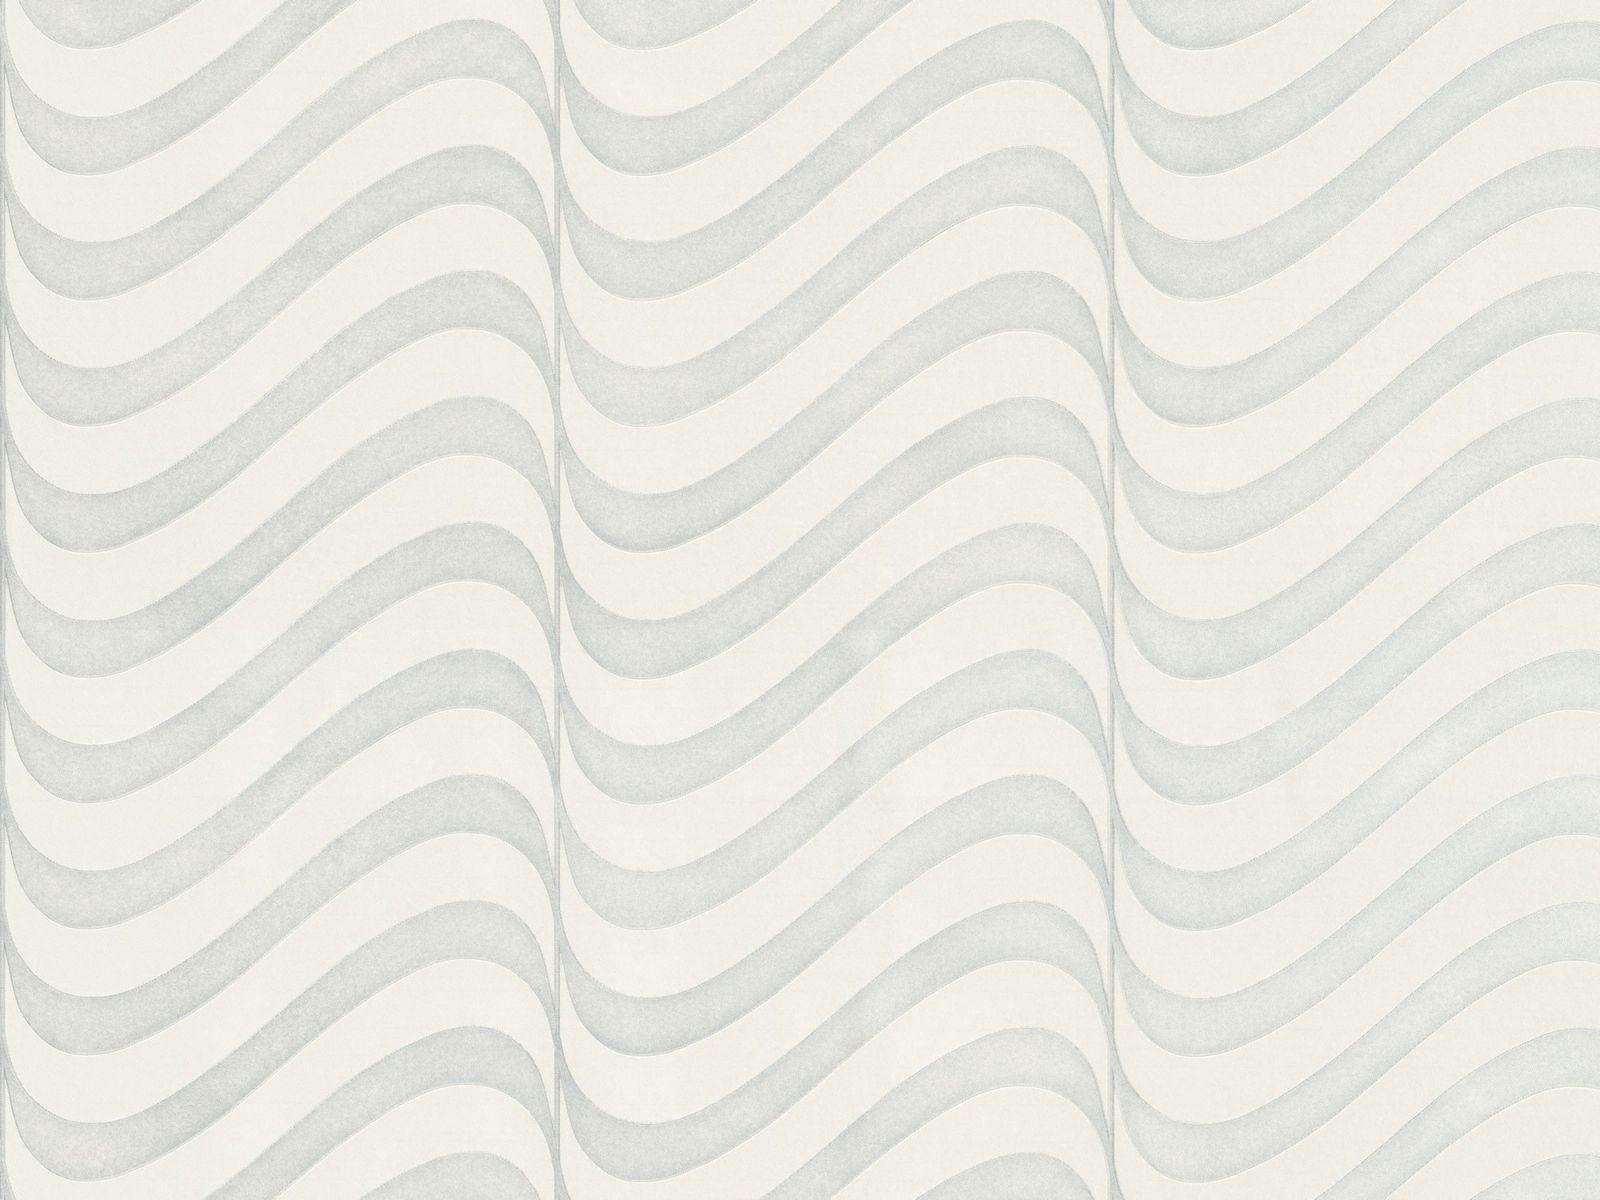 Tapete vlies grafisch silber marburg opulence 56002 for Tapete silber